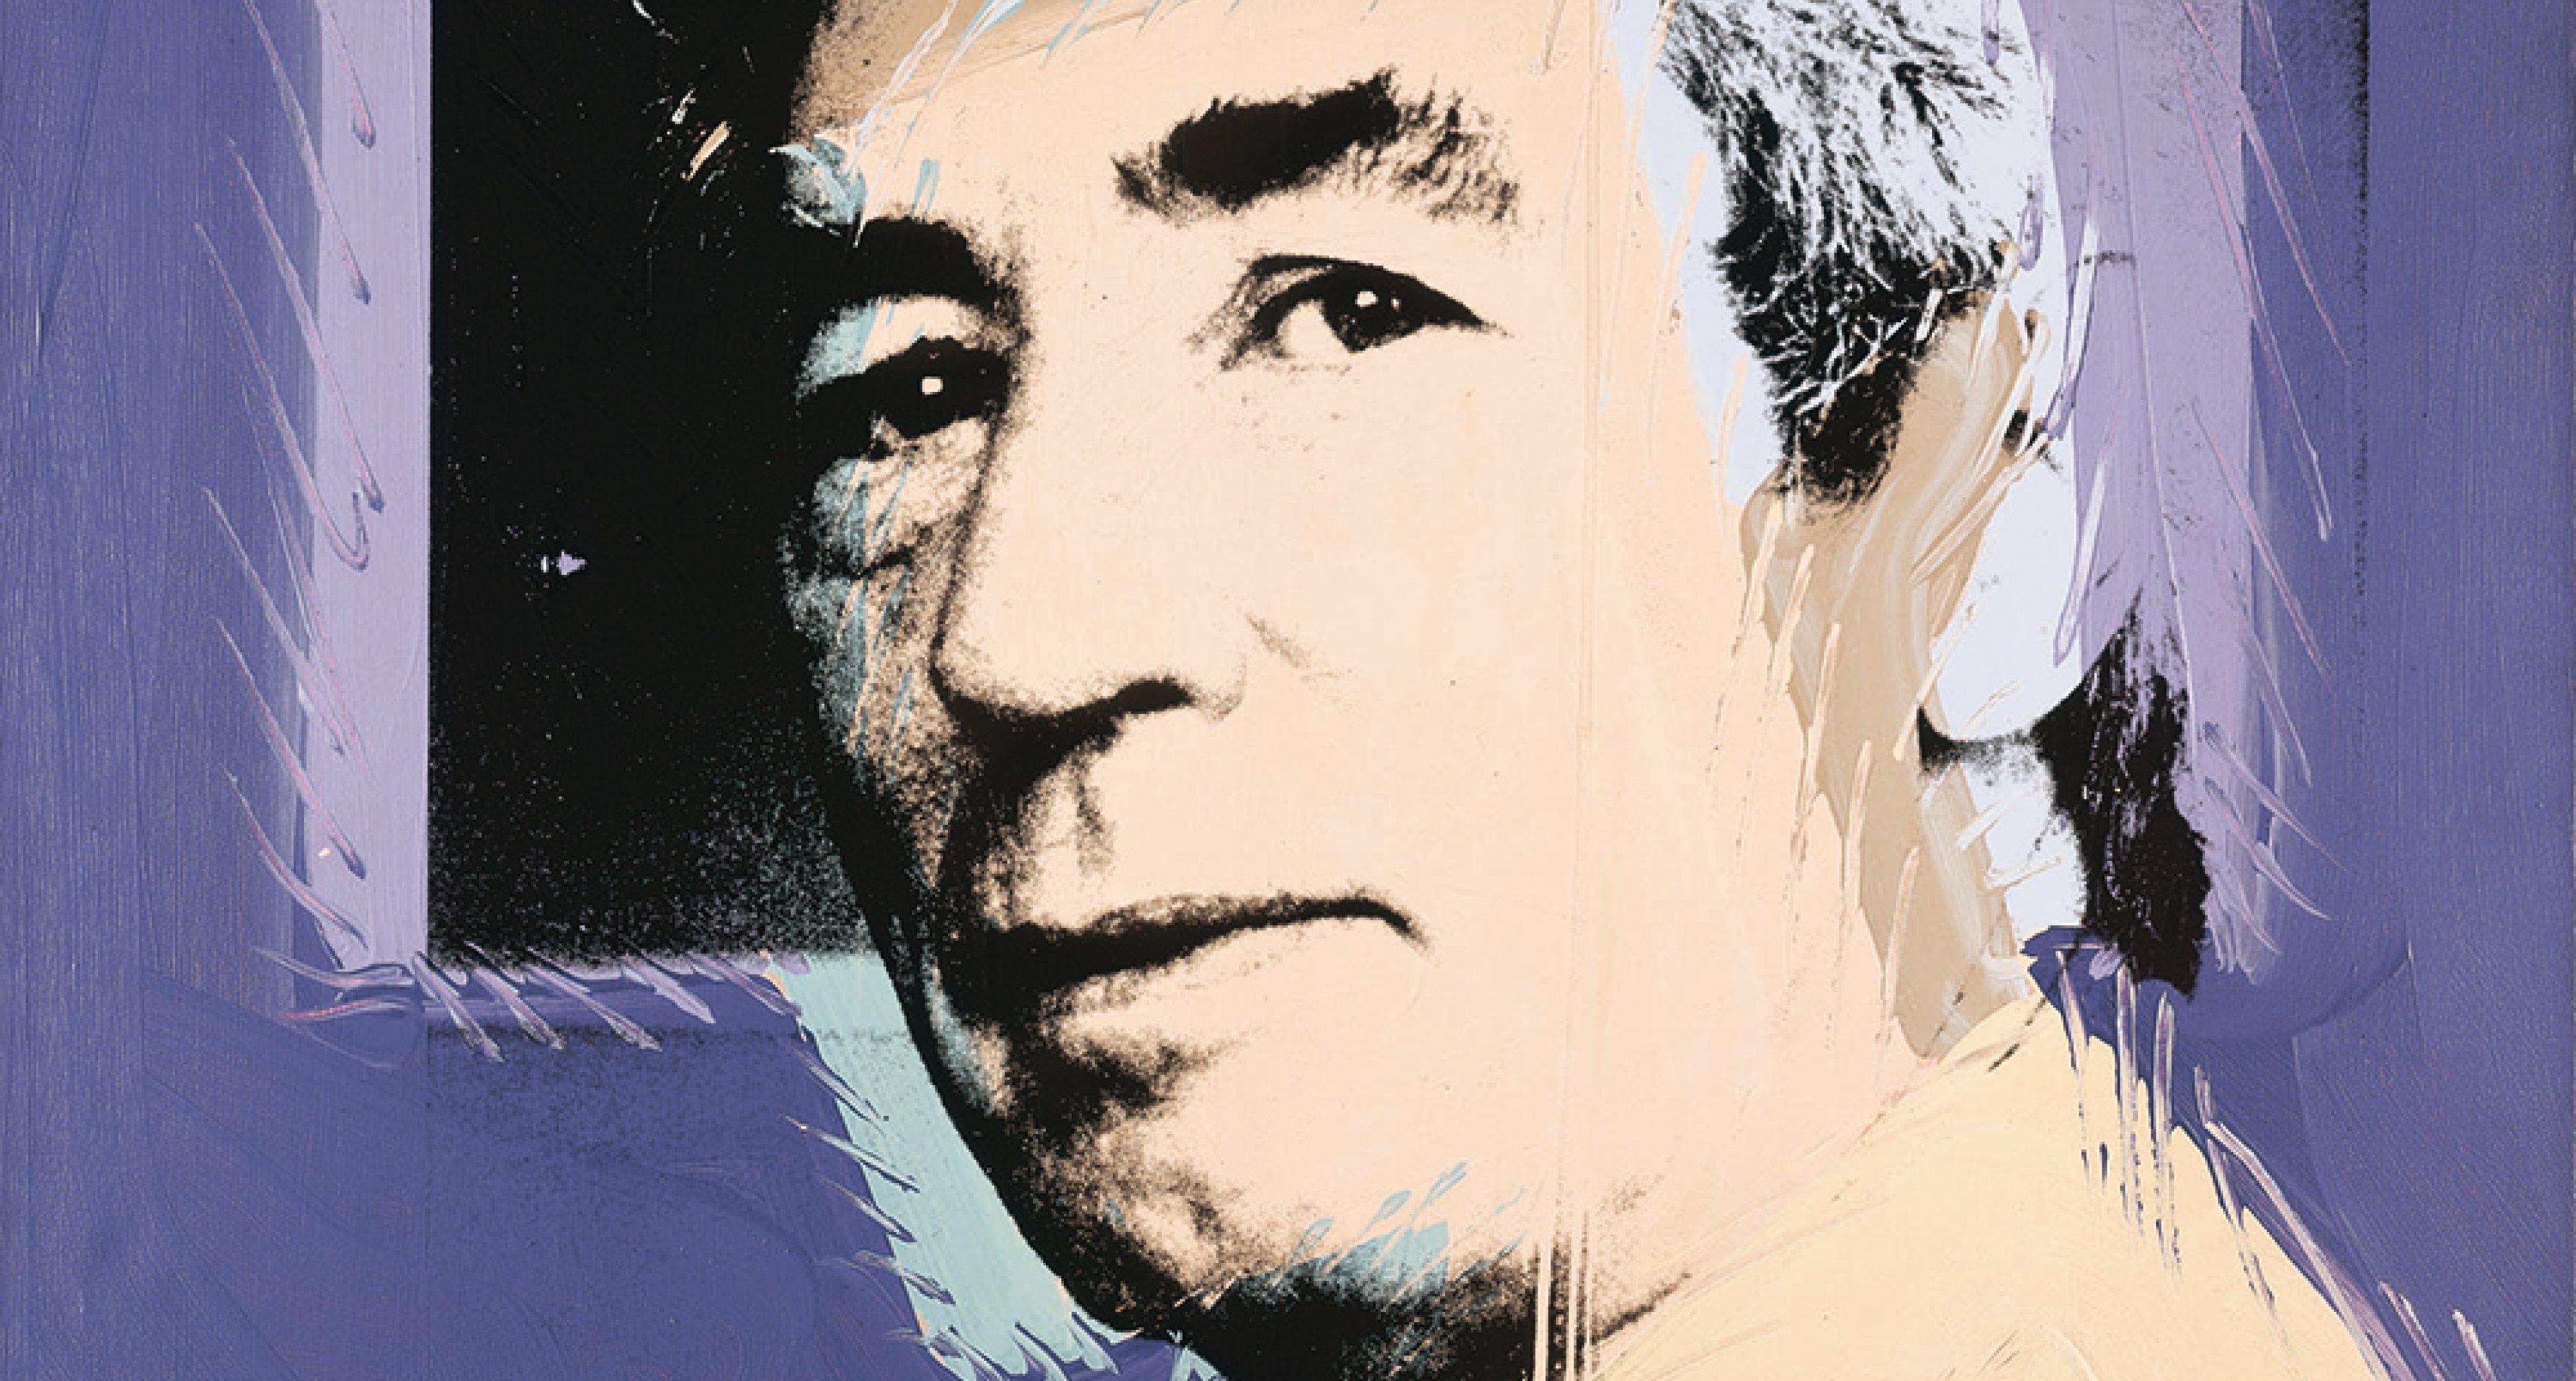 "Andy Warhol ""Portrait d'Hergé"" 1977 © The Andy Warhol Foundation for the Visual Arts, Inc. / ADAGP, Paris 2016 - © Jean–Pol Stercq / ADAGP, Paris 2016"